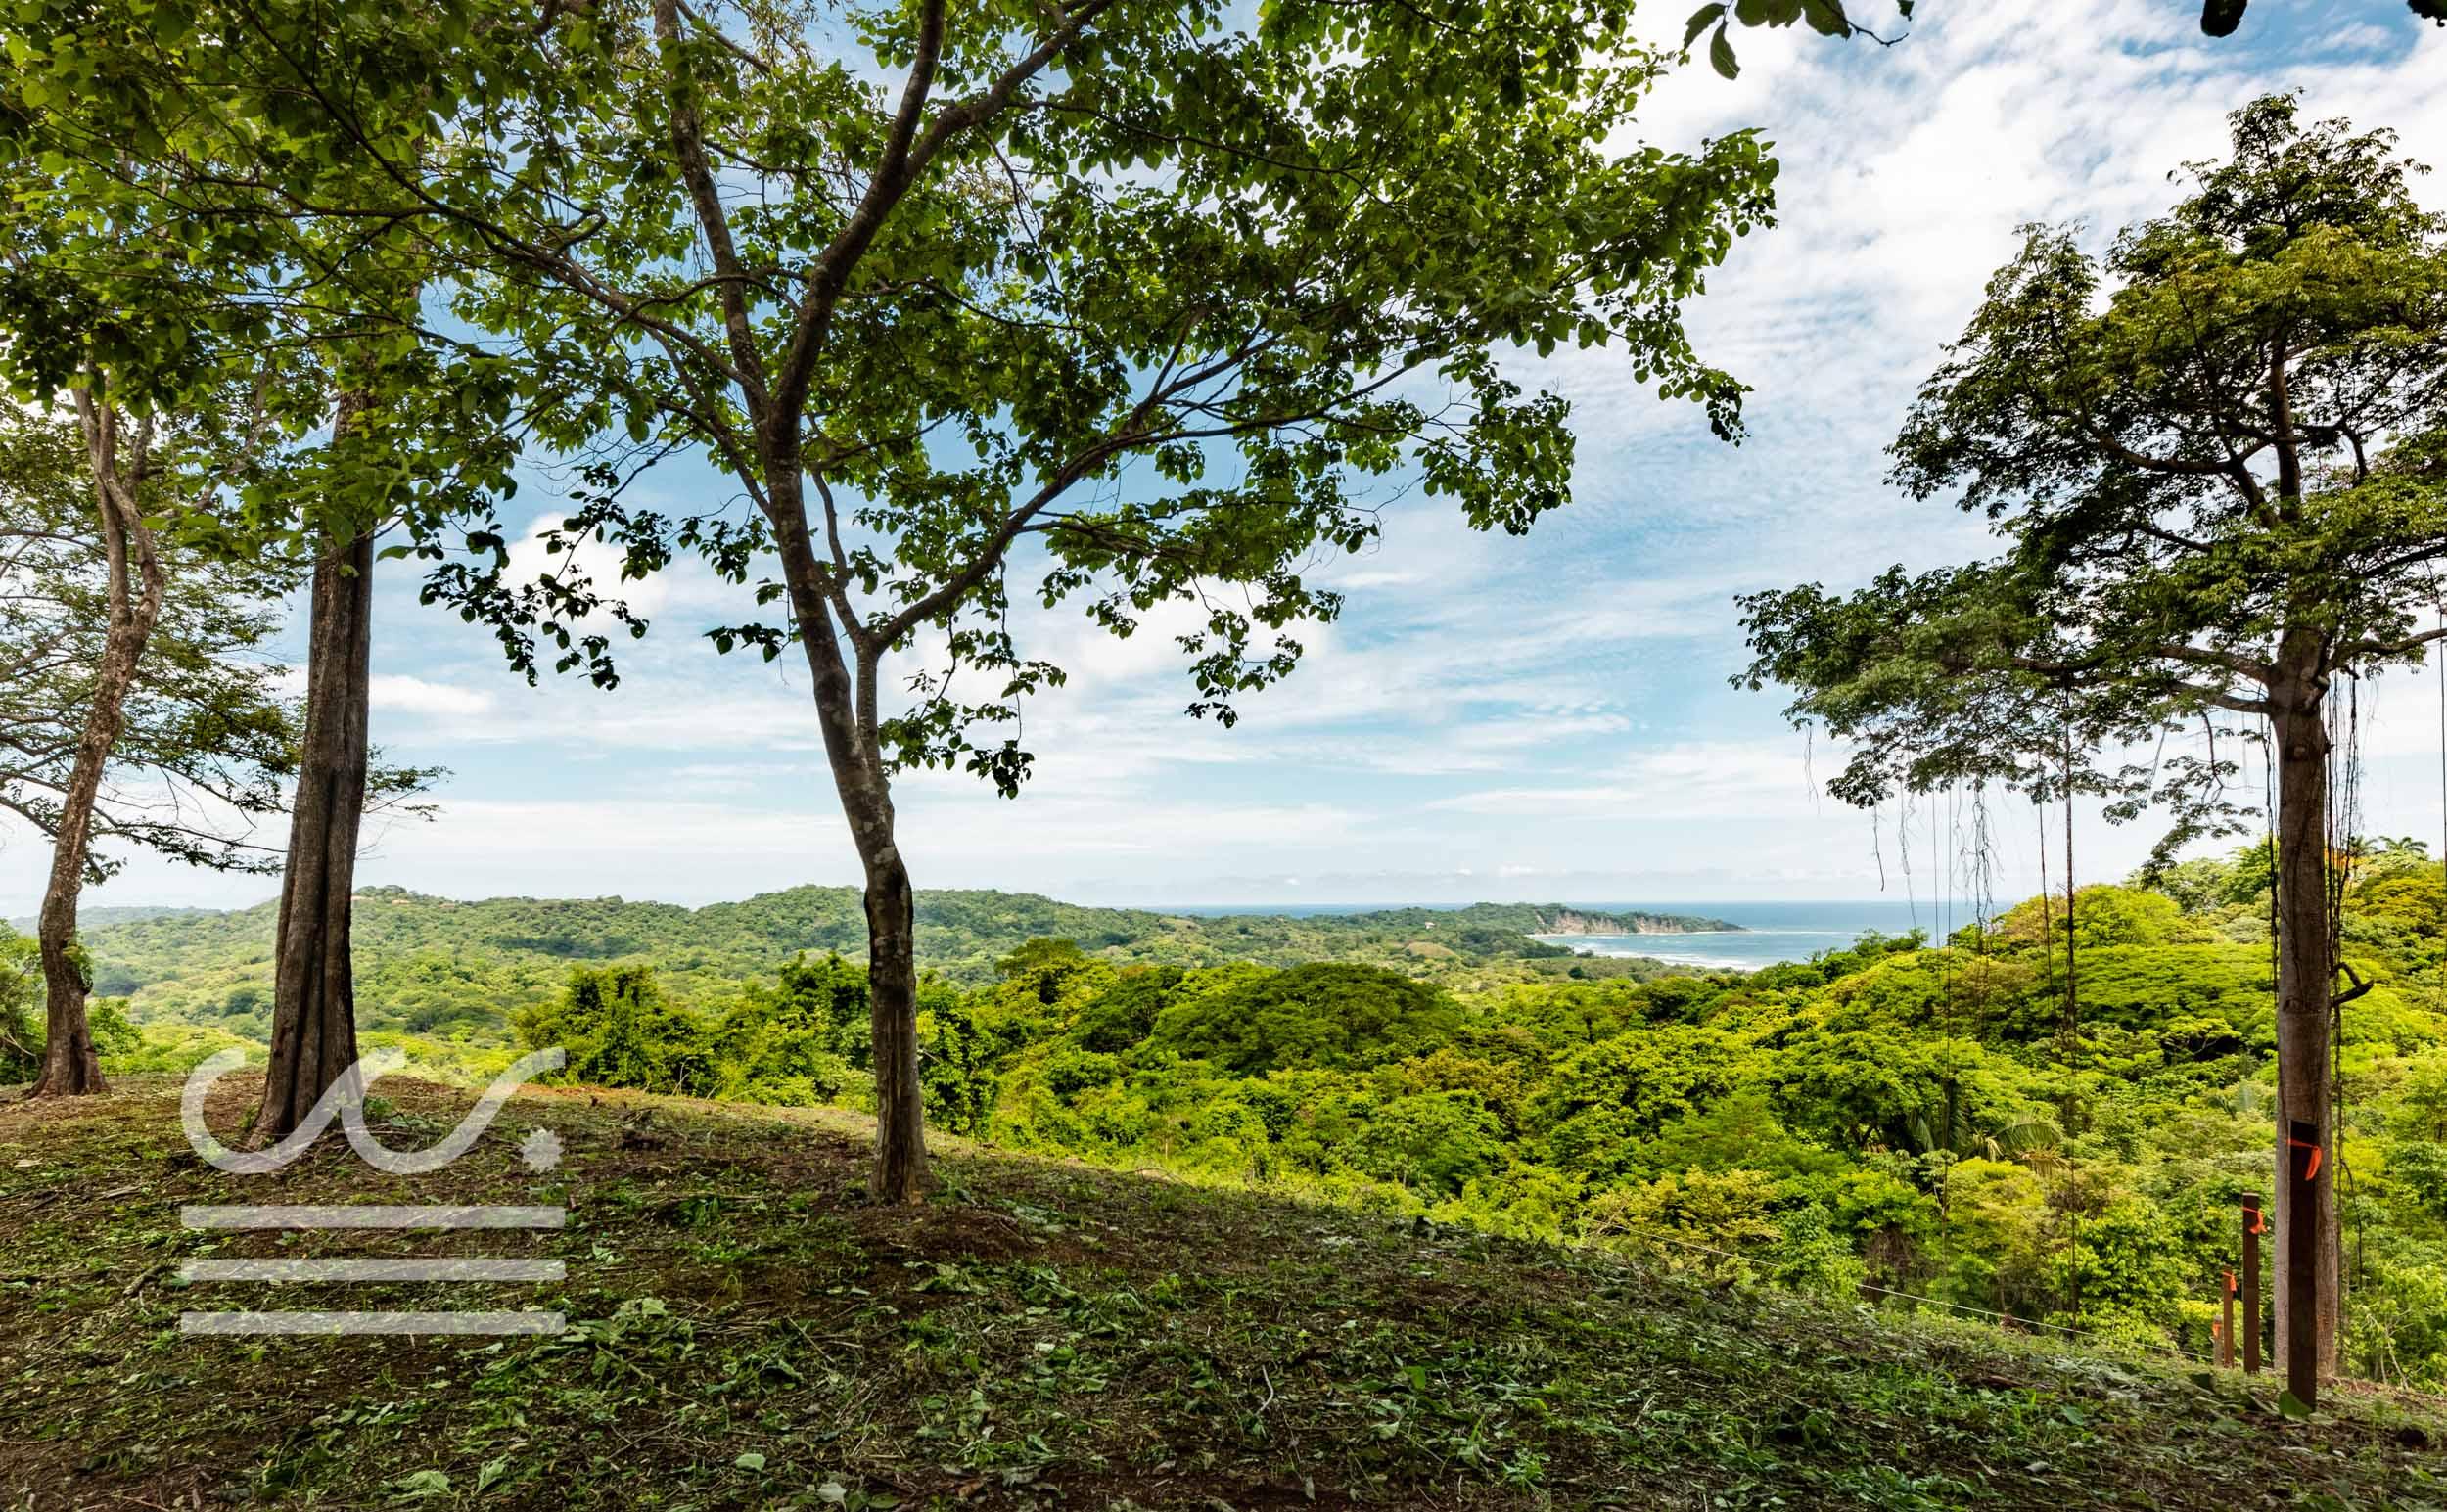 EE-101-Lot-Wanderlust-Realty-Real-Estate-Nosara-Costa-Rica-5compressed.jpg